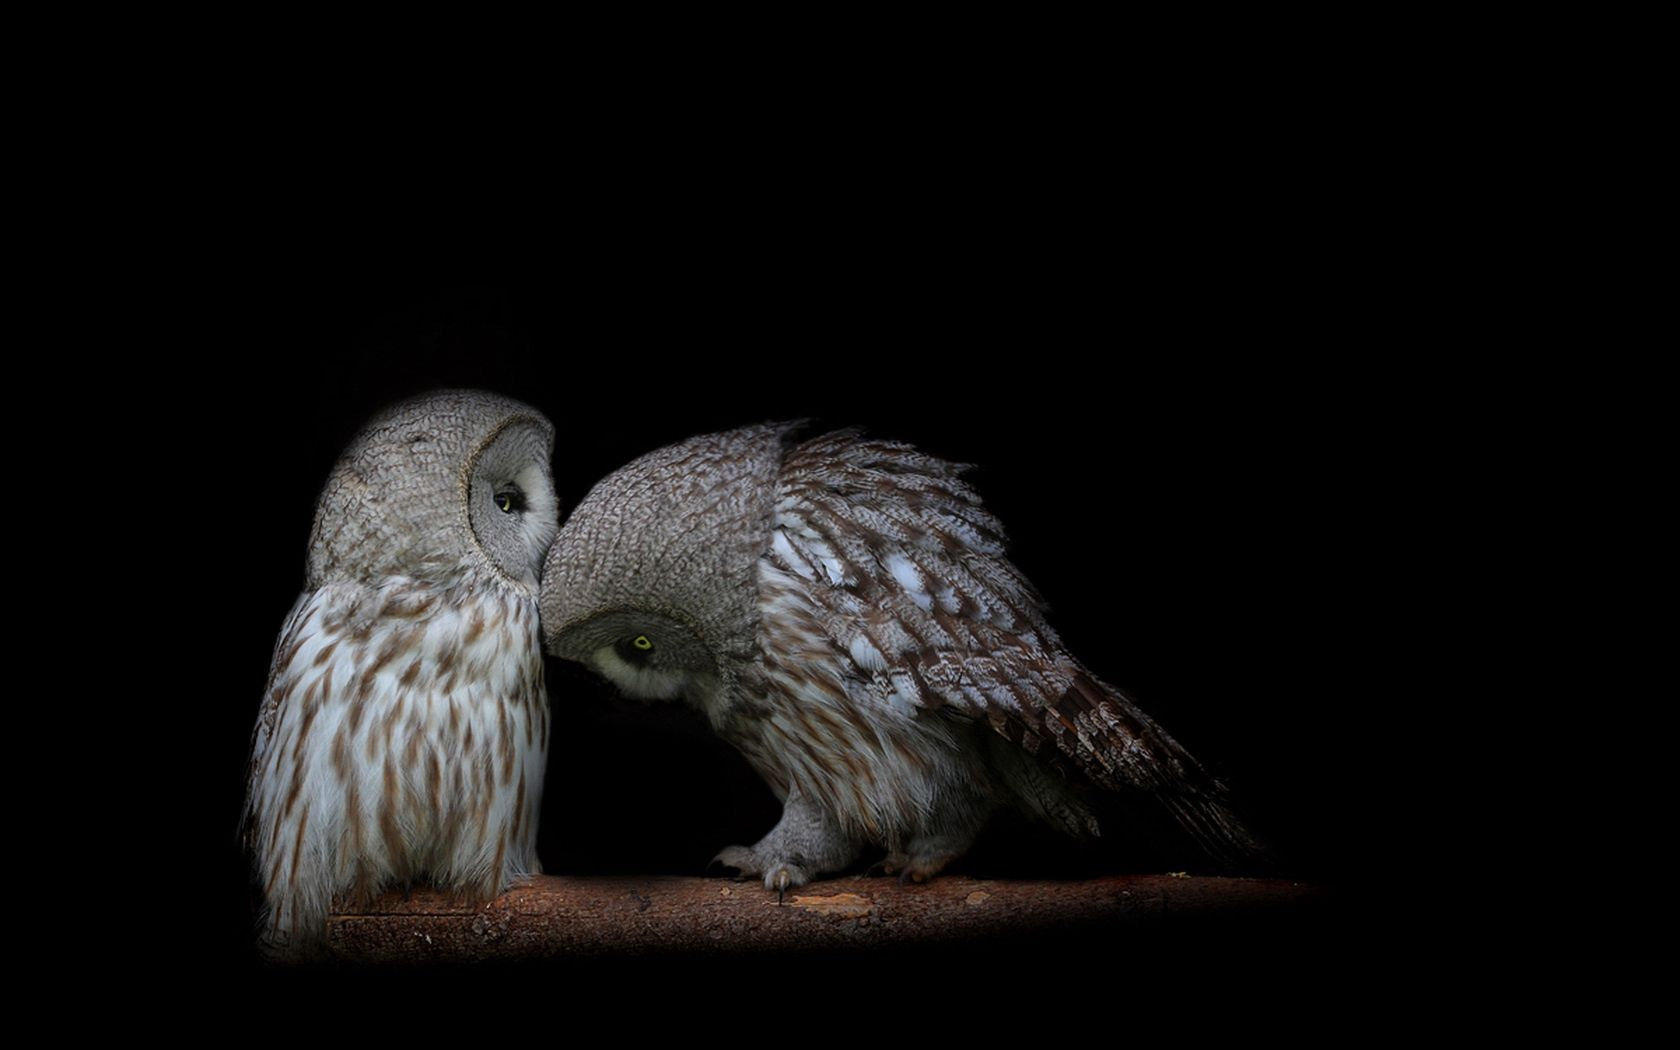 76692 Screensavers and Wallpapers Predators for phone. Download Owl, Predators, Dark, Couple, Pair, Dark Background pictures for free